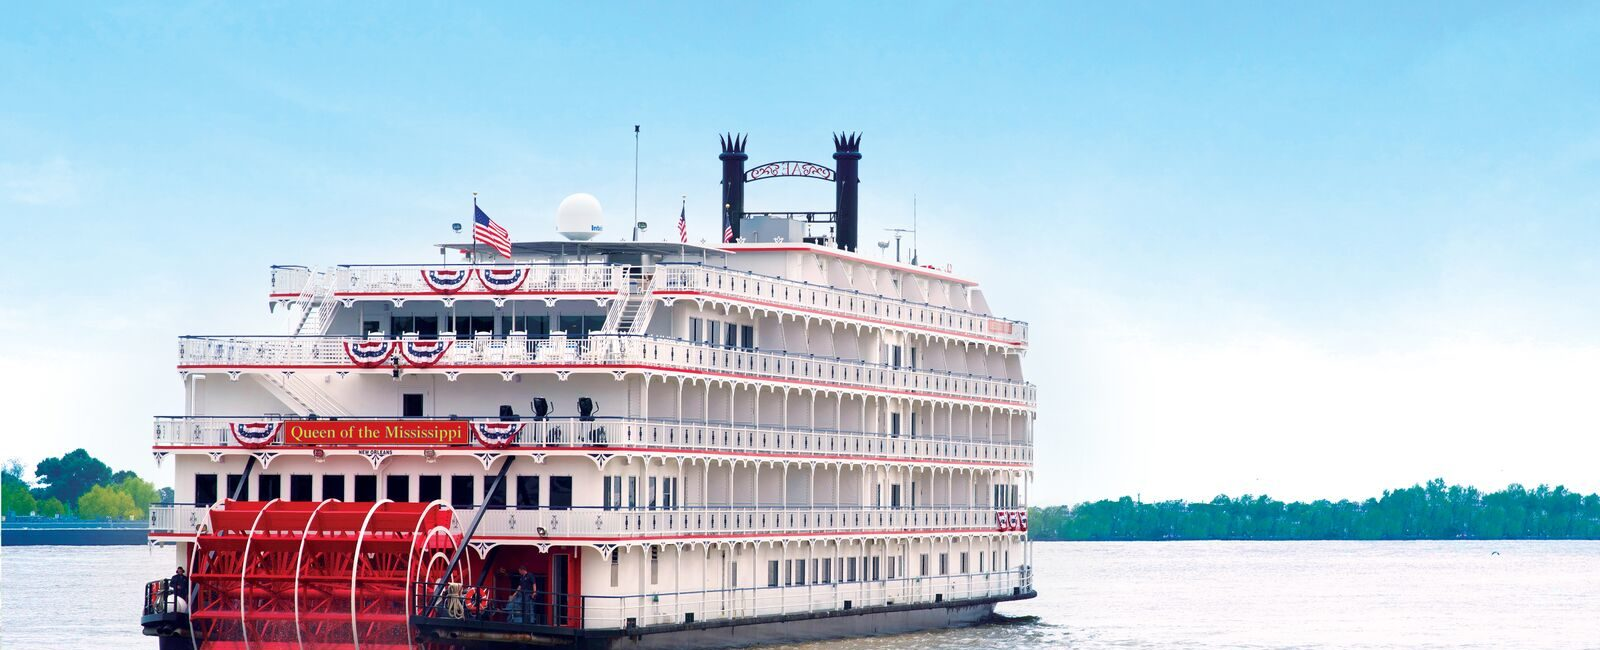 Cruise April 2020.Mississippi Golf Cruise April 2020